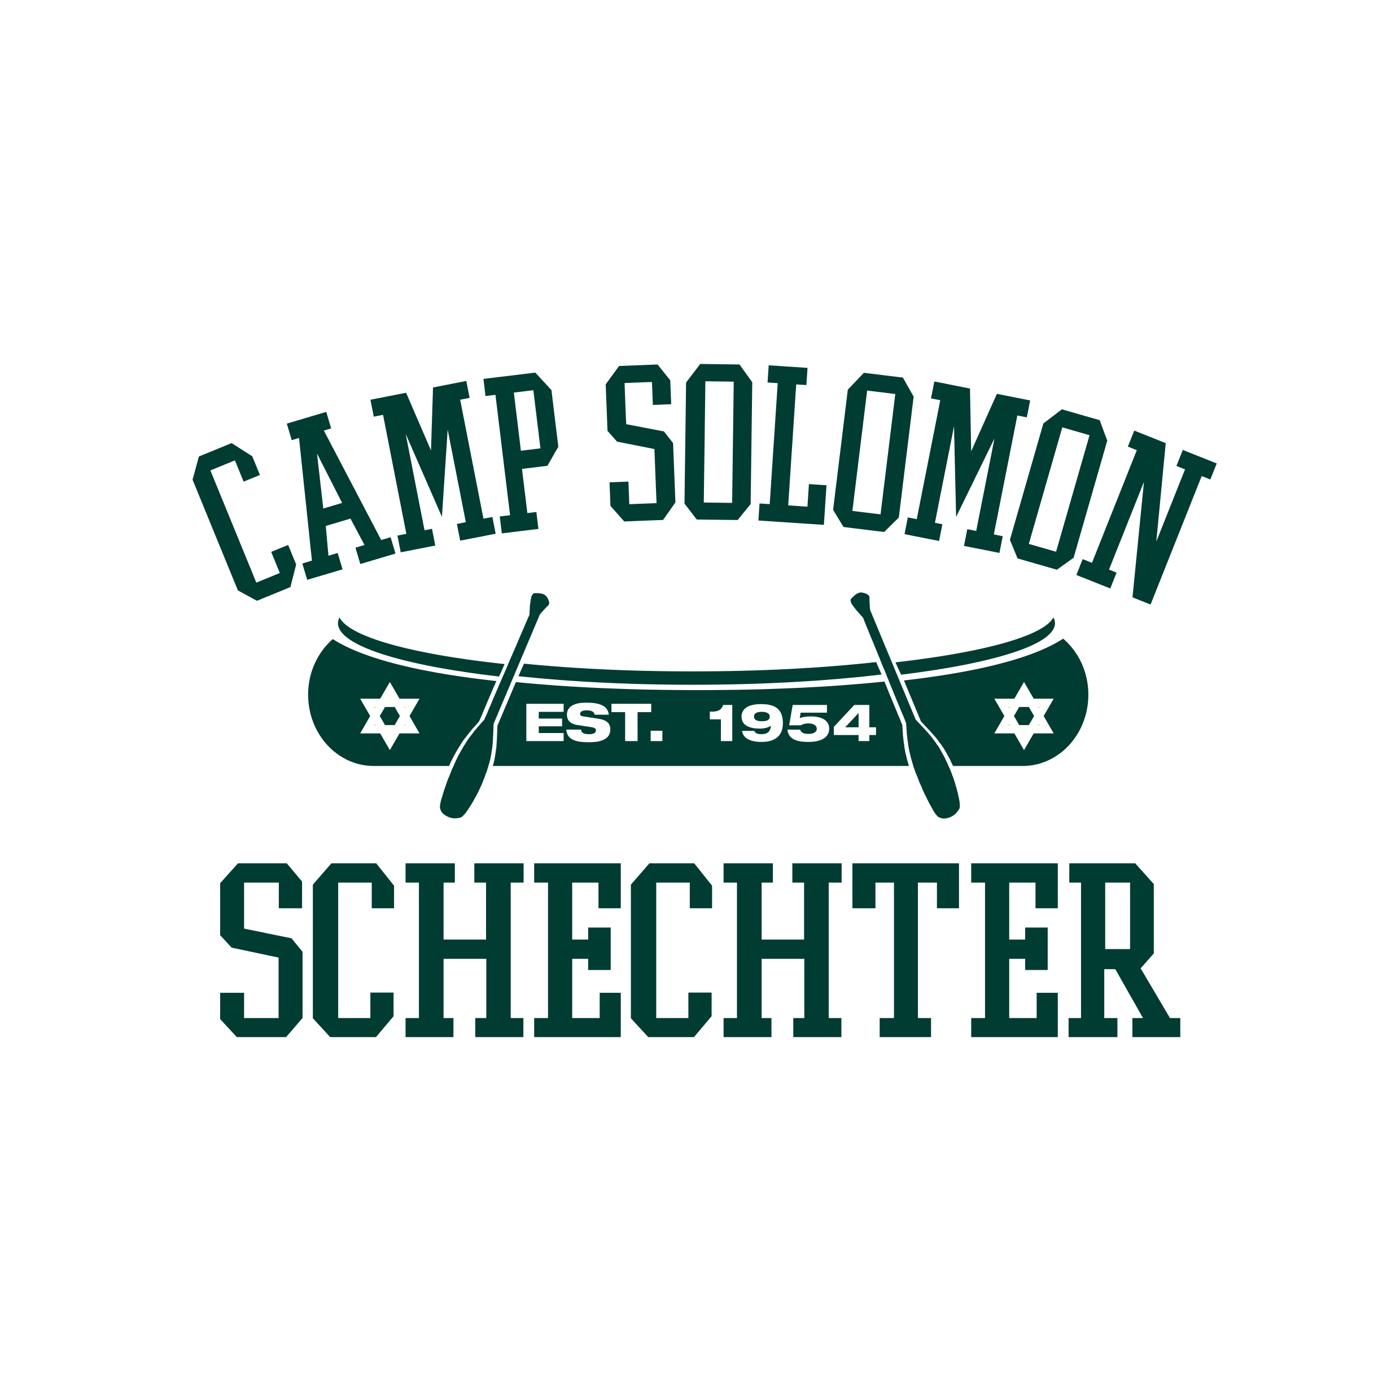 Camp Solomon Schechter